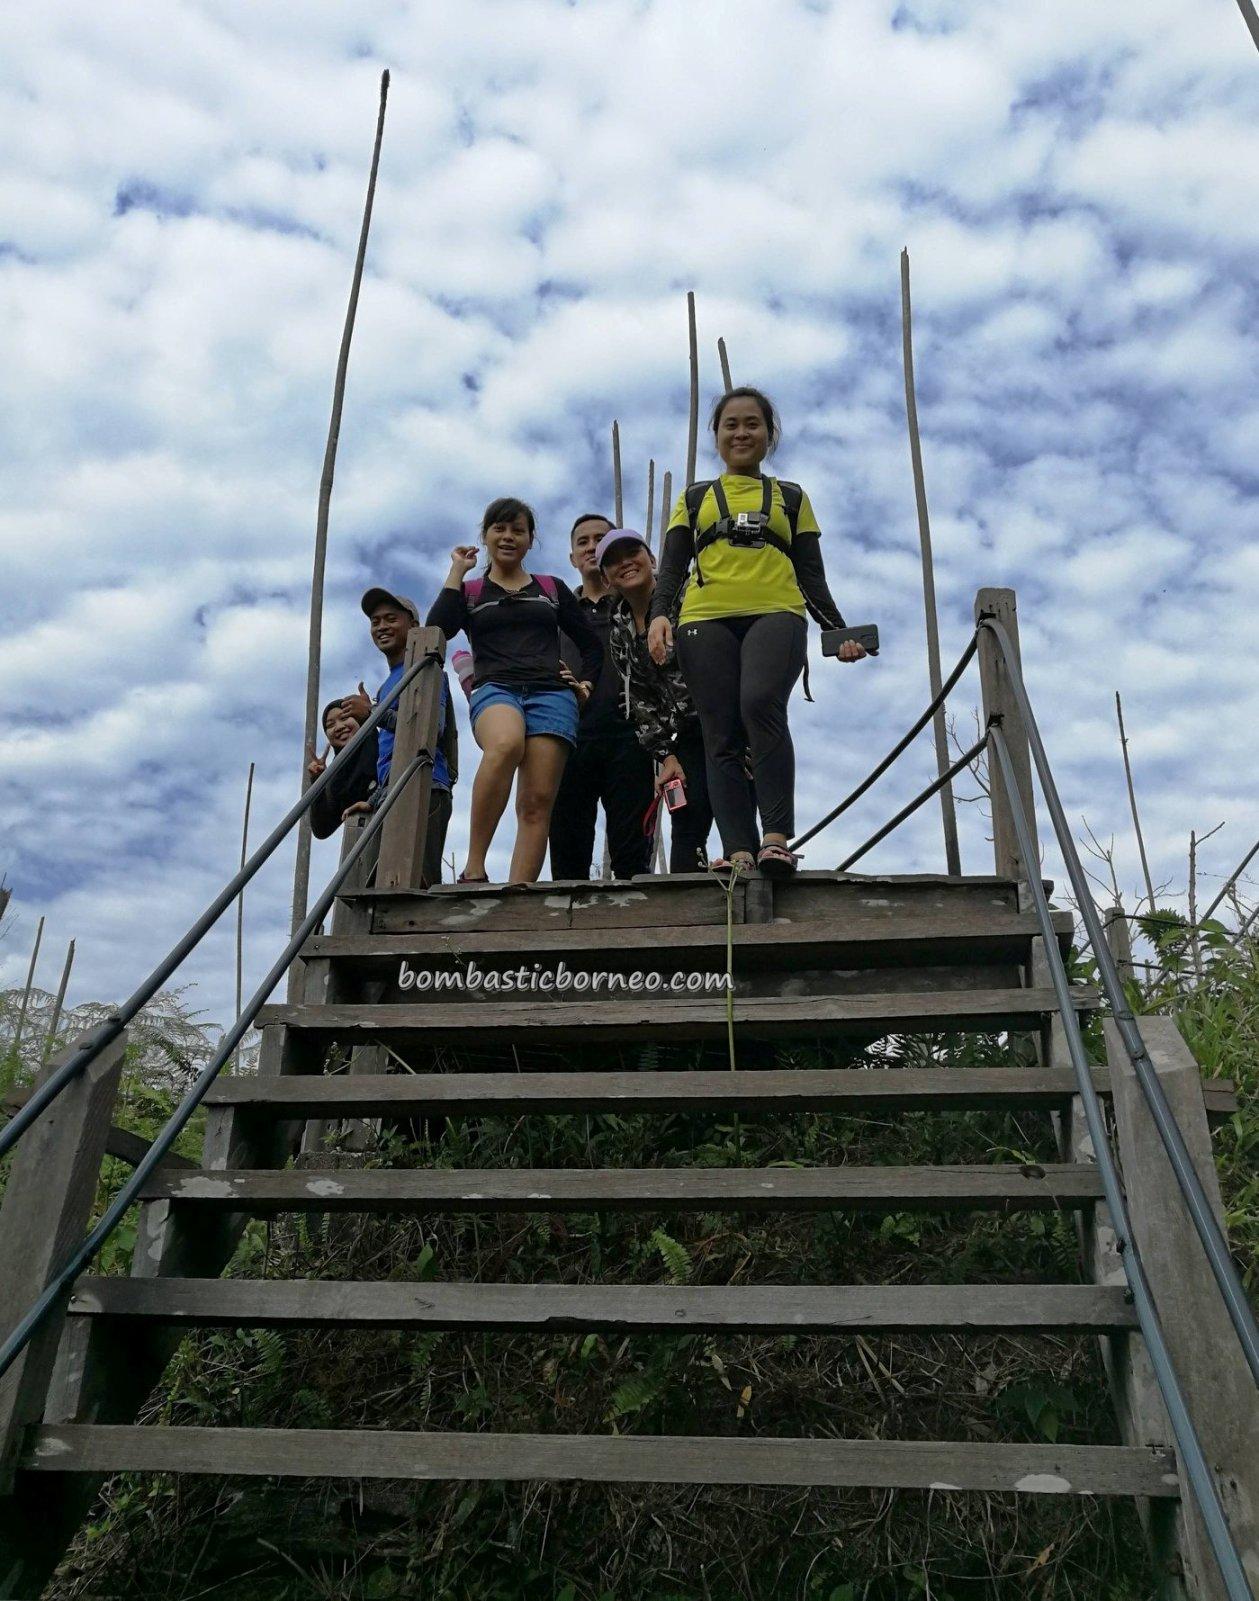 Lakei Island, adventure, nature, outdoor, rainforest, jungle hiking, Kuching, Sarawak, Malaysia, Tourism, Pulau Tok Nan, Datuk Haji Ibrahim Mausoleum, transborder, 砂拉越马来西亚, 峇哥国家公园